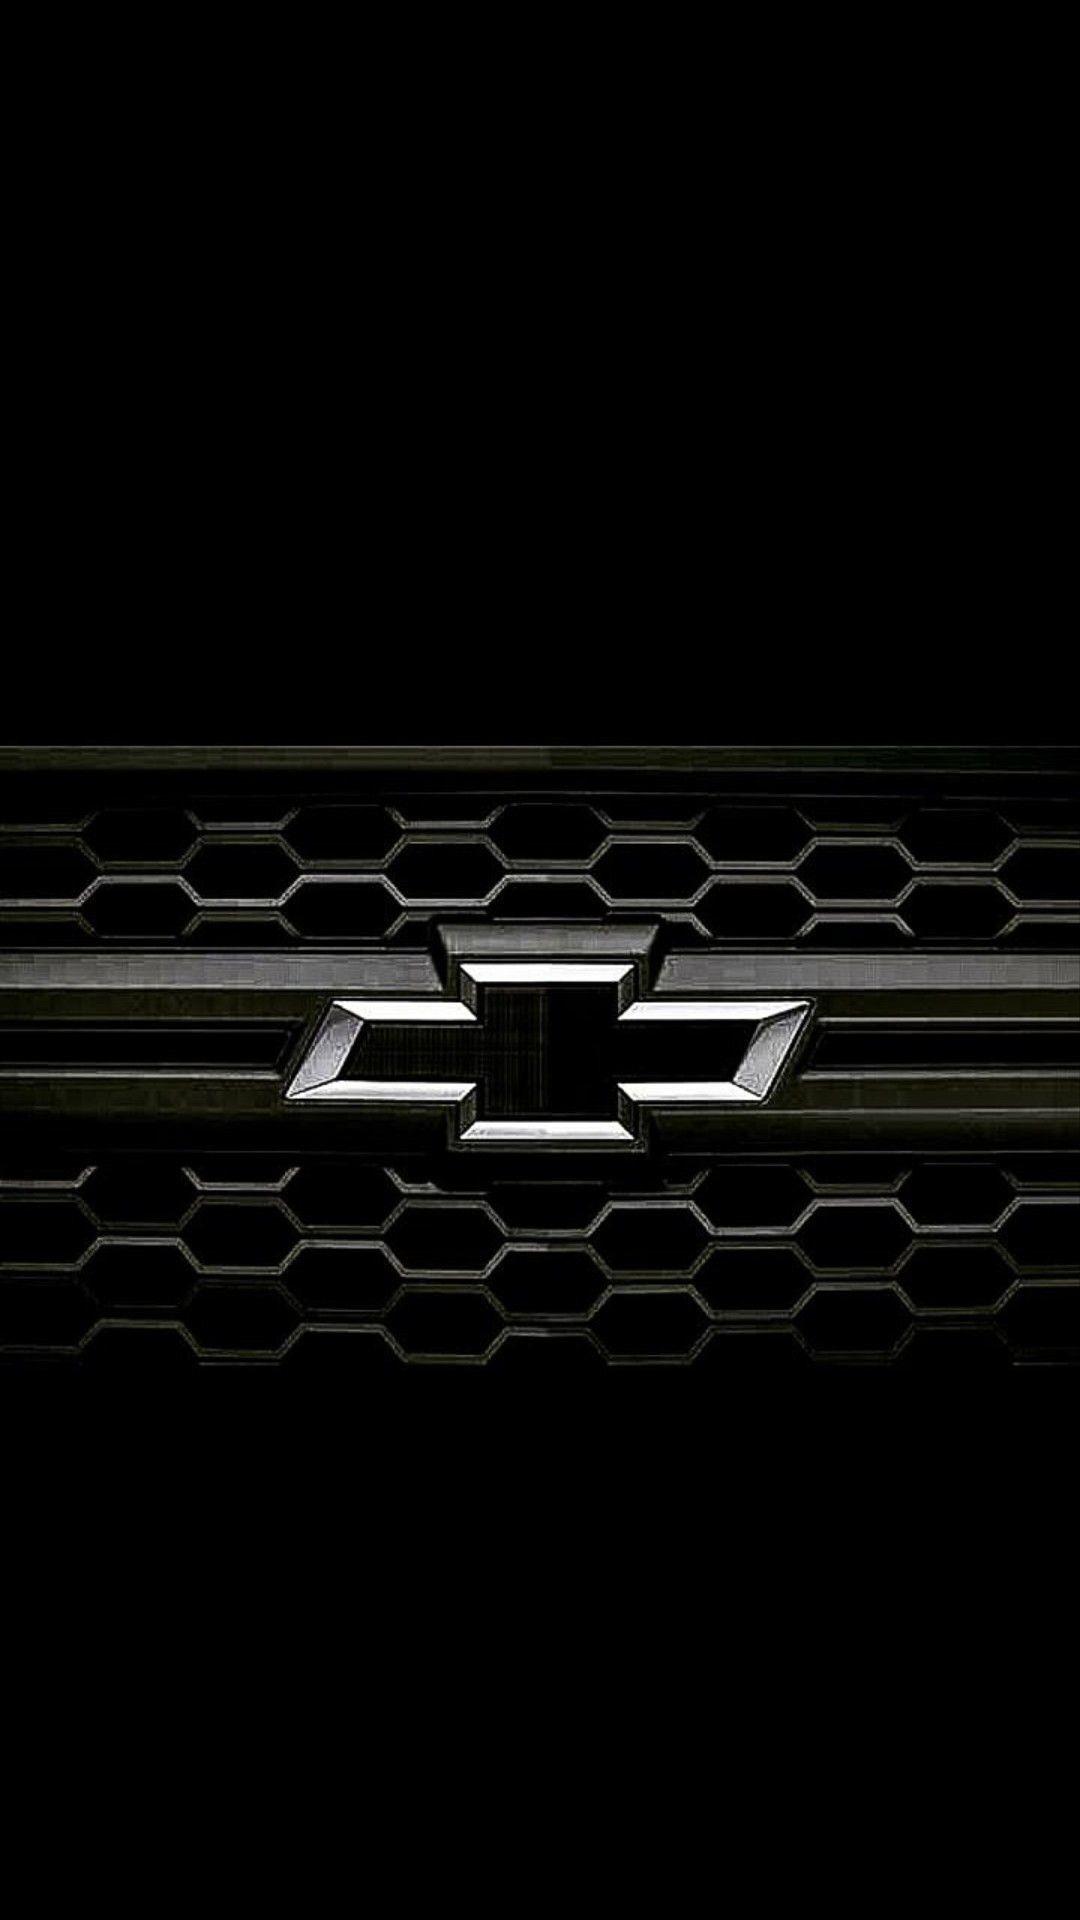 Chevy Emblem Wallpaper (71+ images)